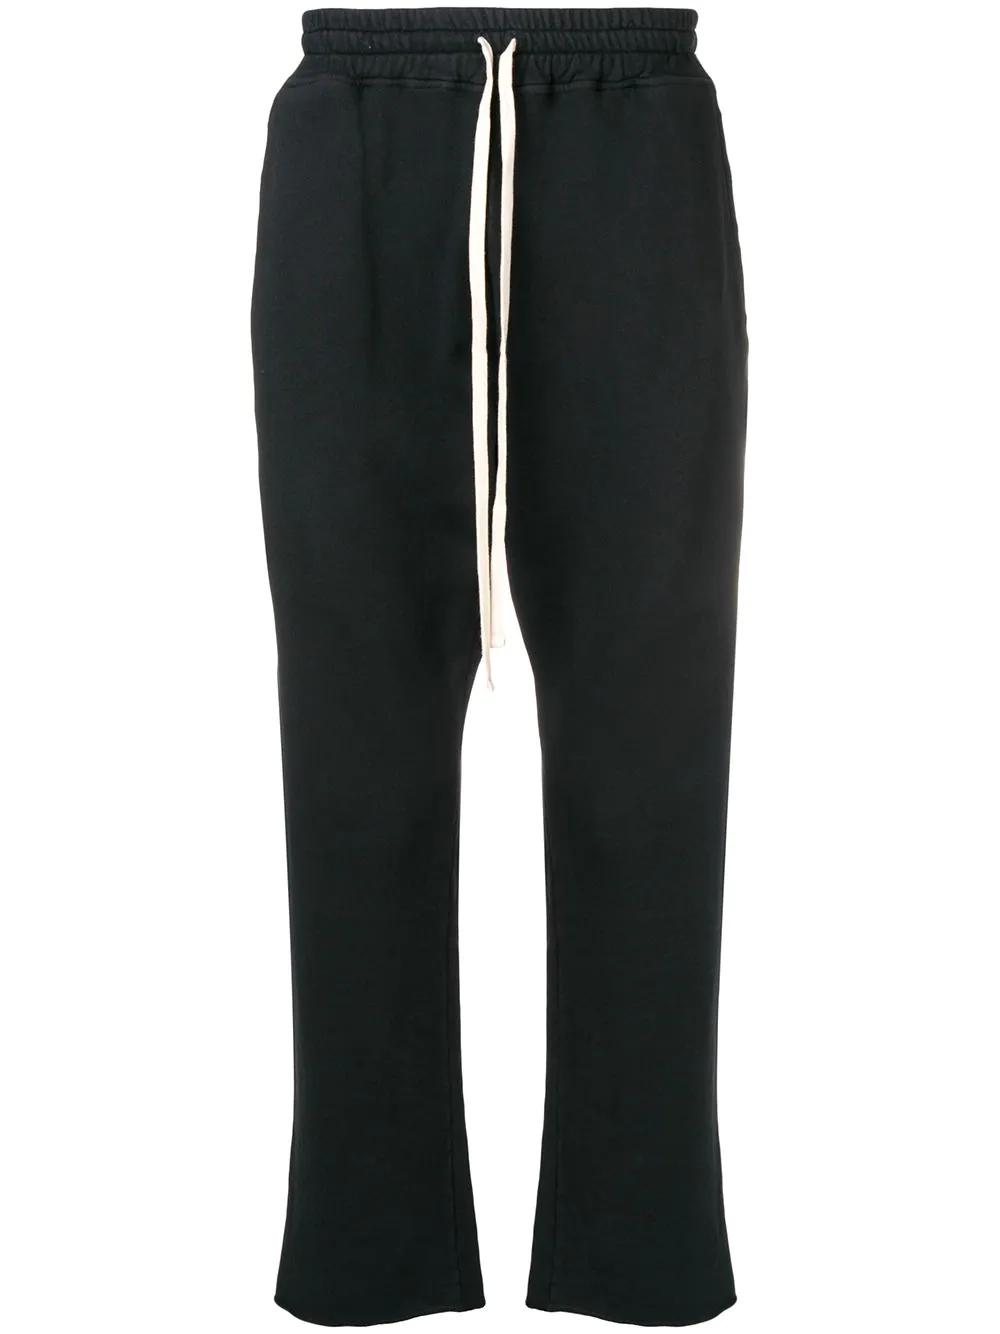 Billy Los Angeles | Billy Los Angeles спортивные брюки с принтом логотипа | Clouty